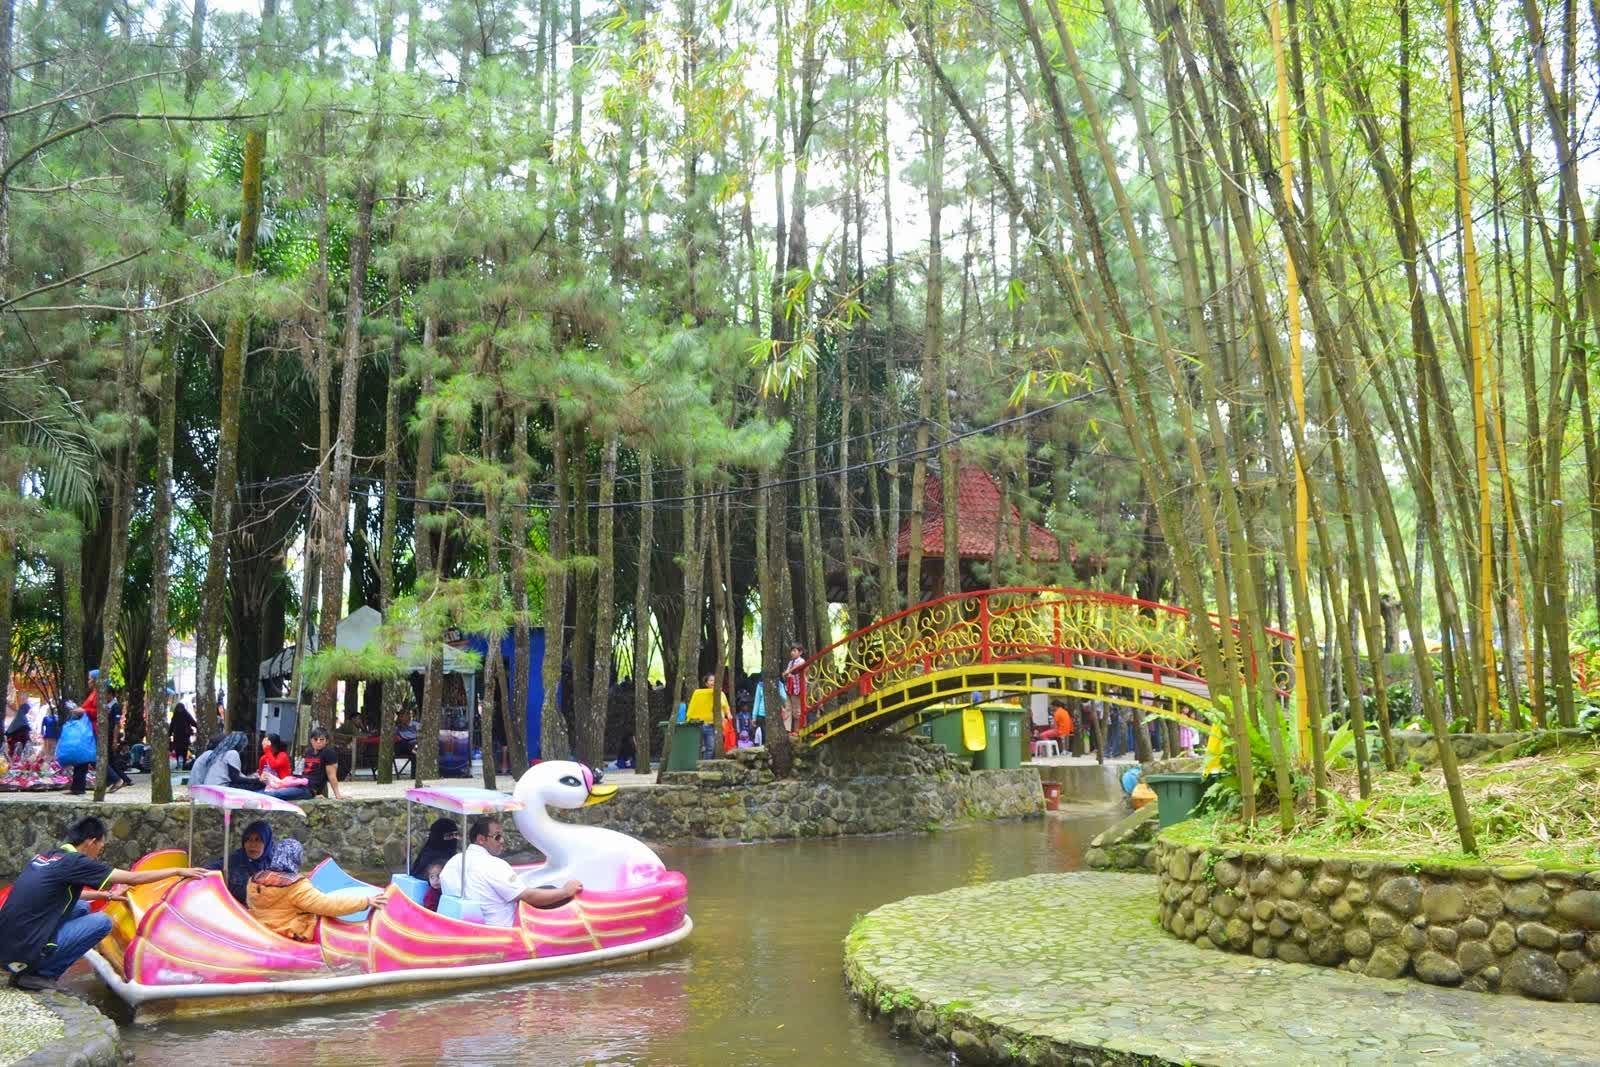 Wahana Menarik Wajib Dikunjungi Di Taman Wisata Matahari